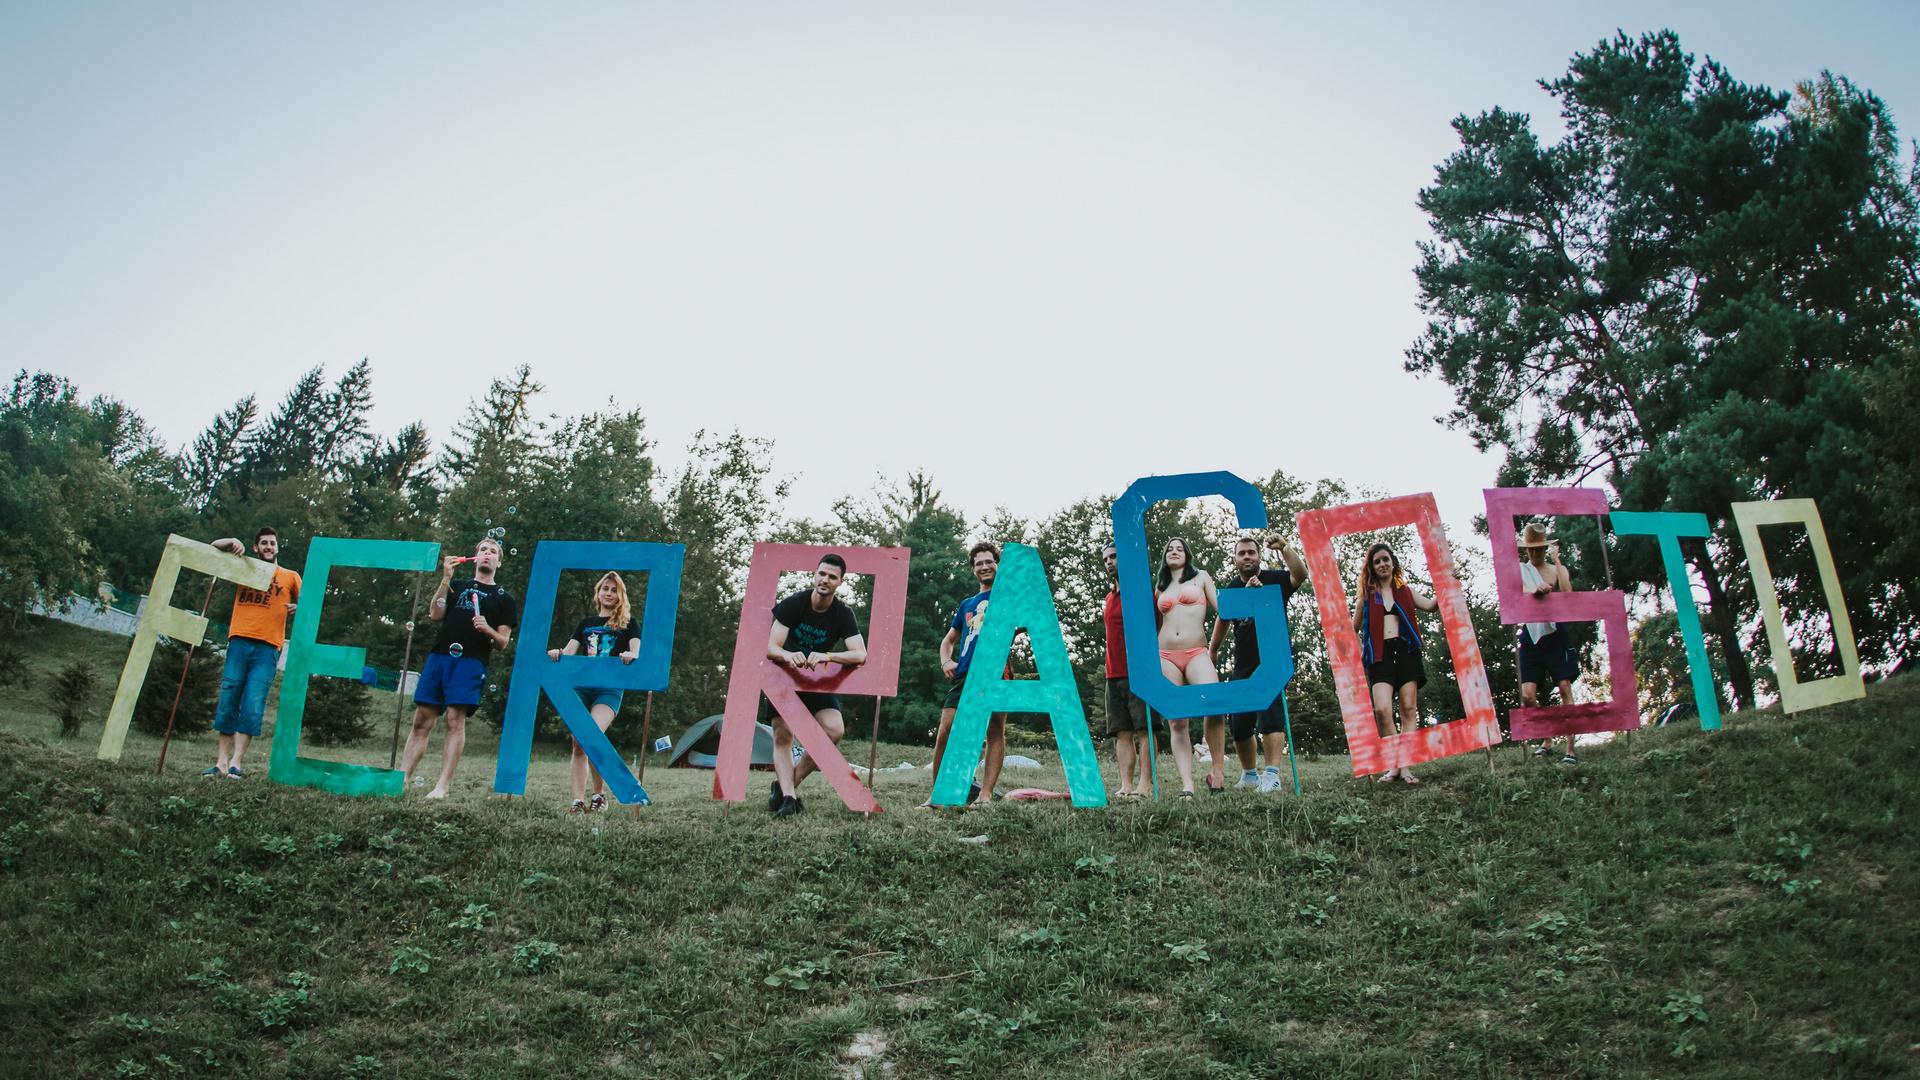 Samo jedan dan do početka festivala | Ferragosto JAM